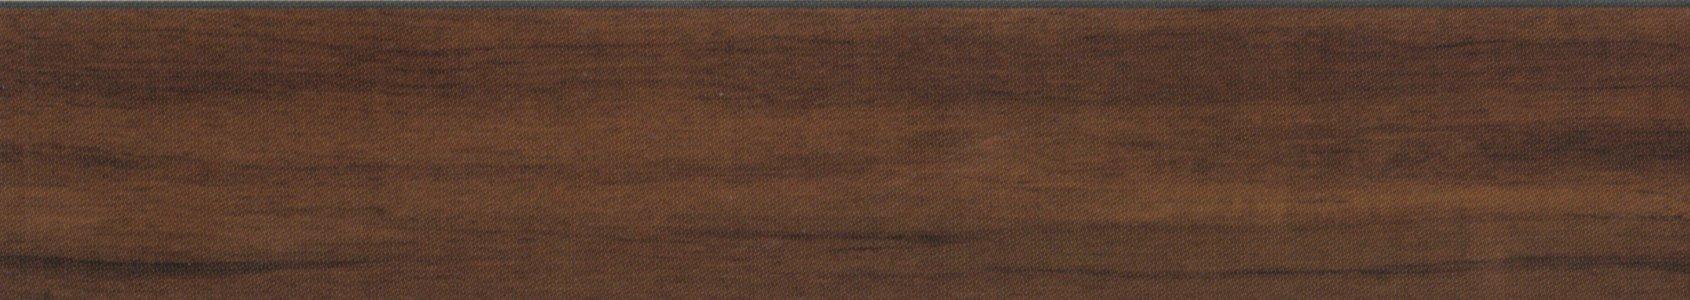 Pavimento in pvc autoadesivo senso nautic superficie for Piastrelle pvc adesive